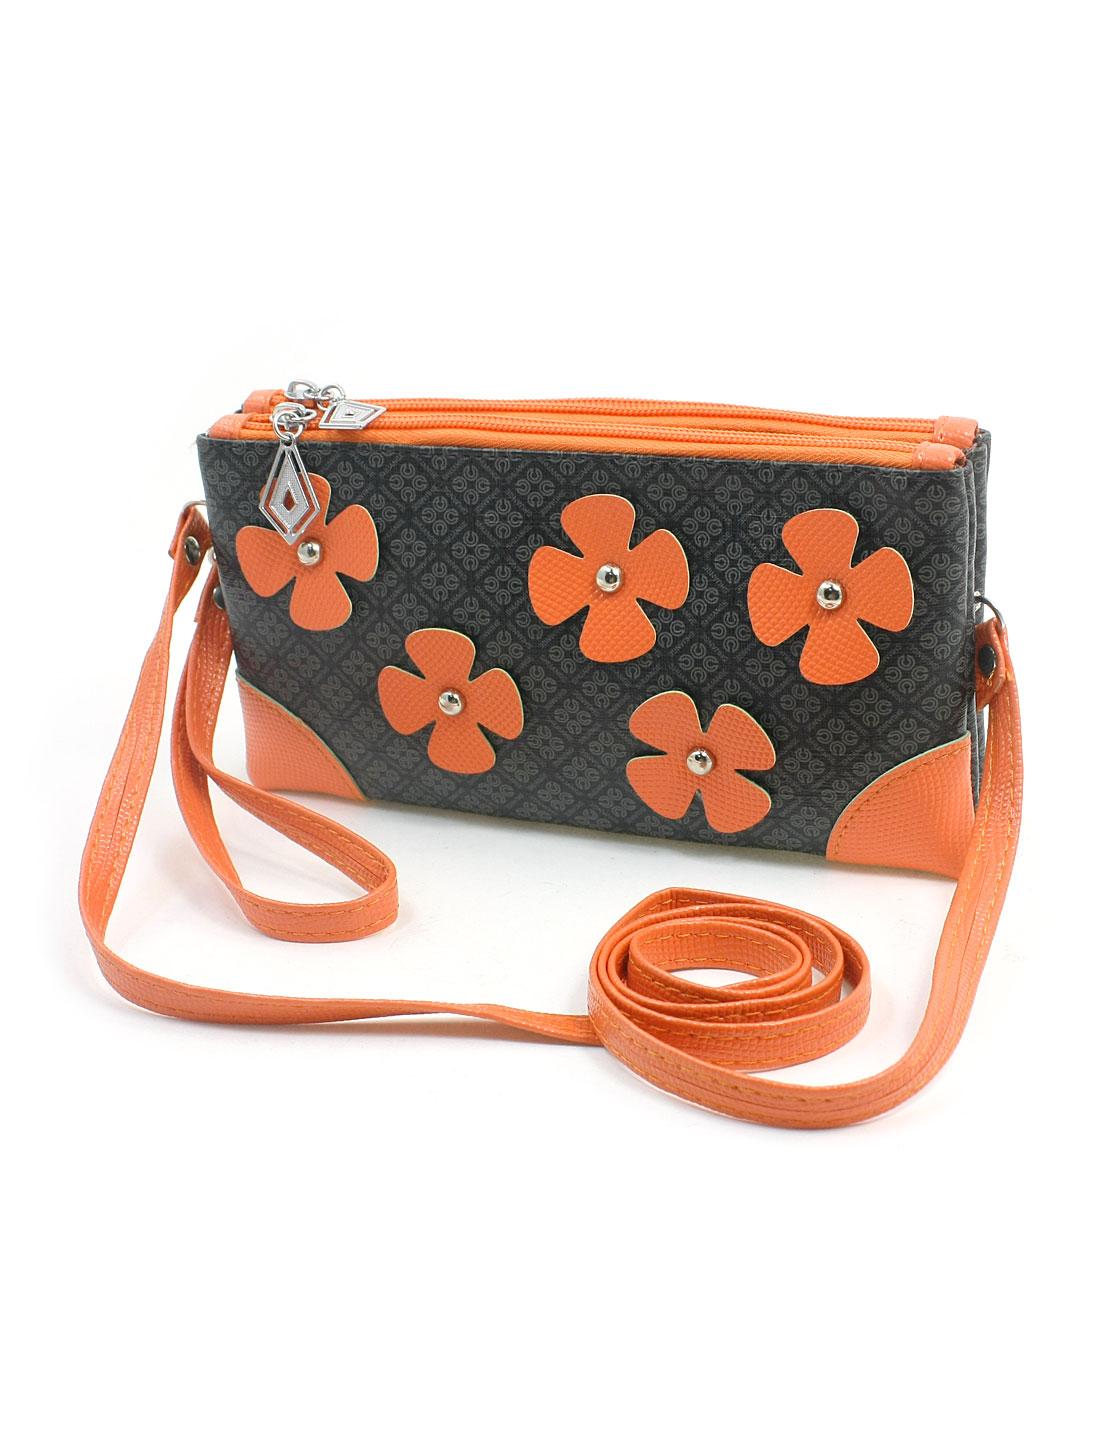 Woman Zippered 3 Compartments Five Orange Flowers Decor Plaid Pattern Dark Gray Faux Leather Shoulder Bag Purse Wallet w Hand Strap